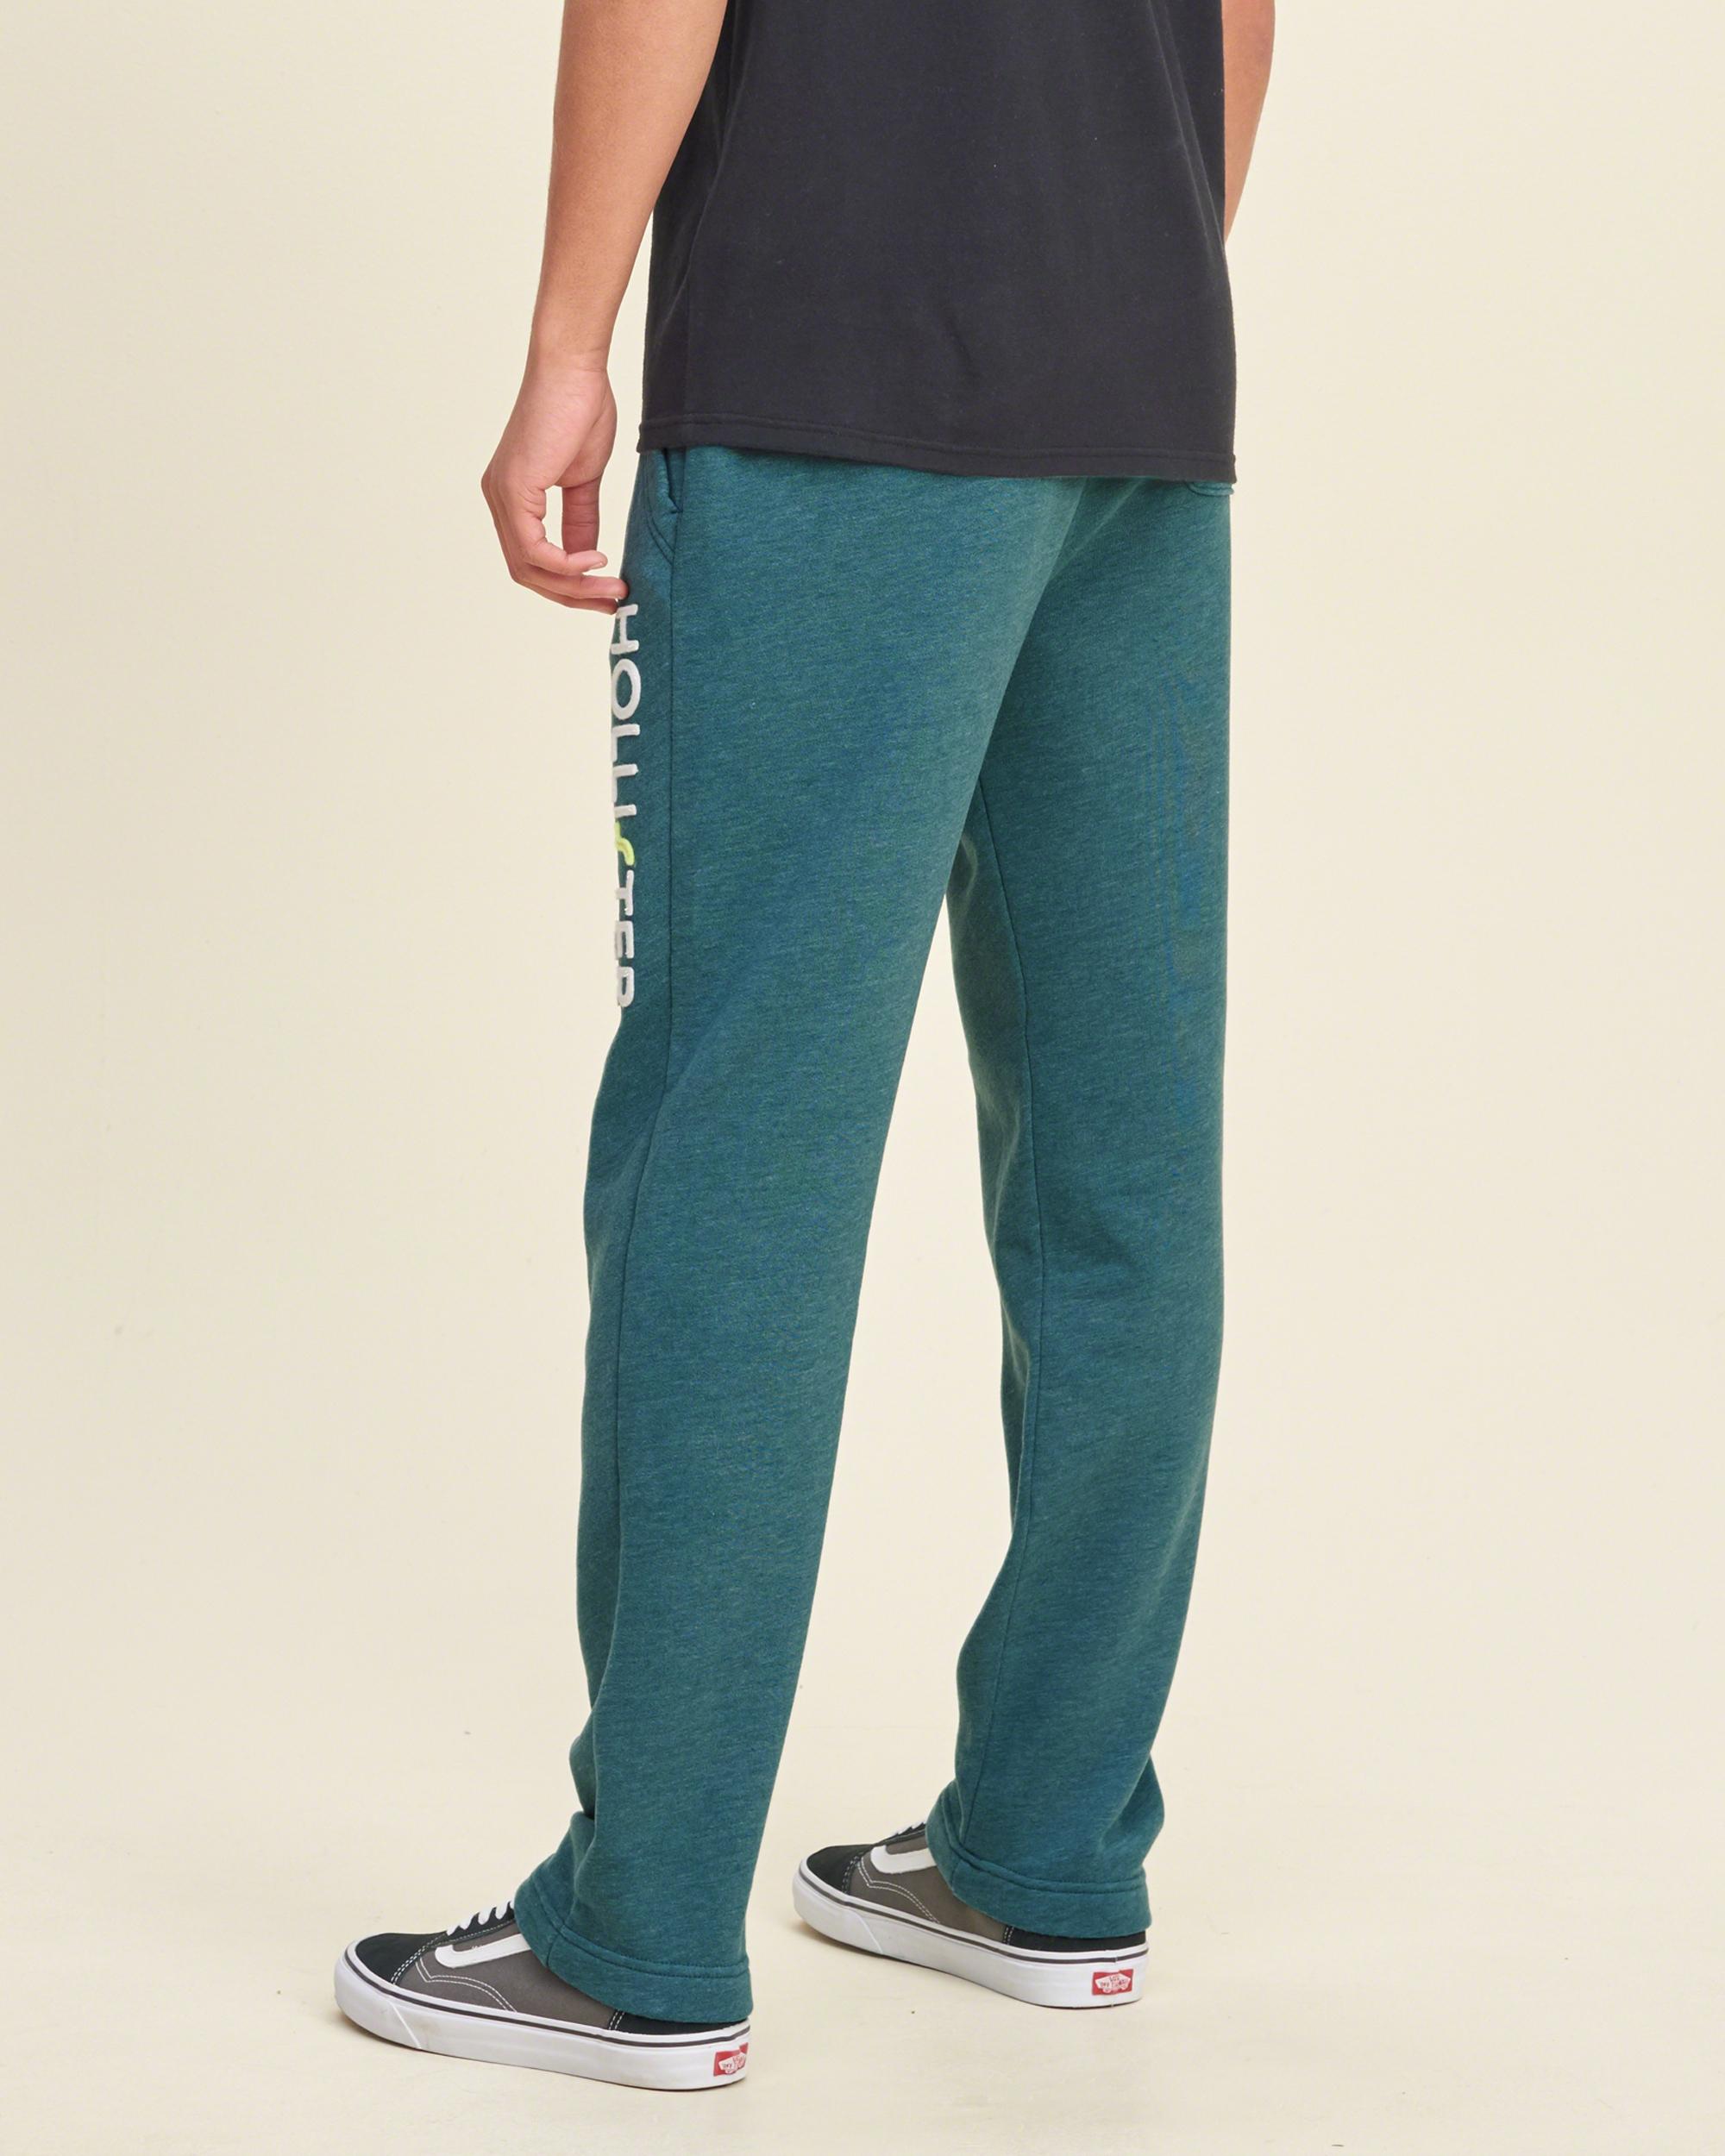 hollister jeans for men logo - photo #20